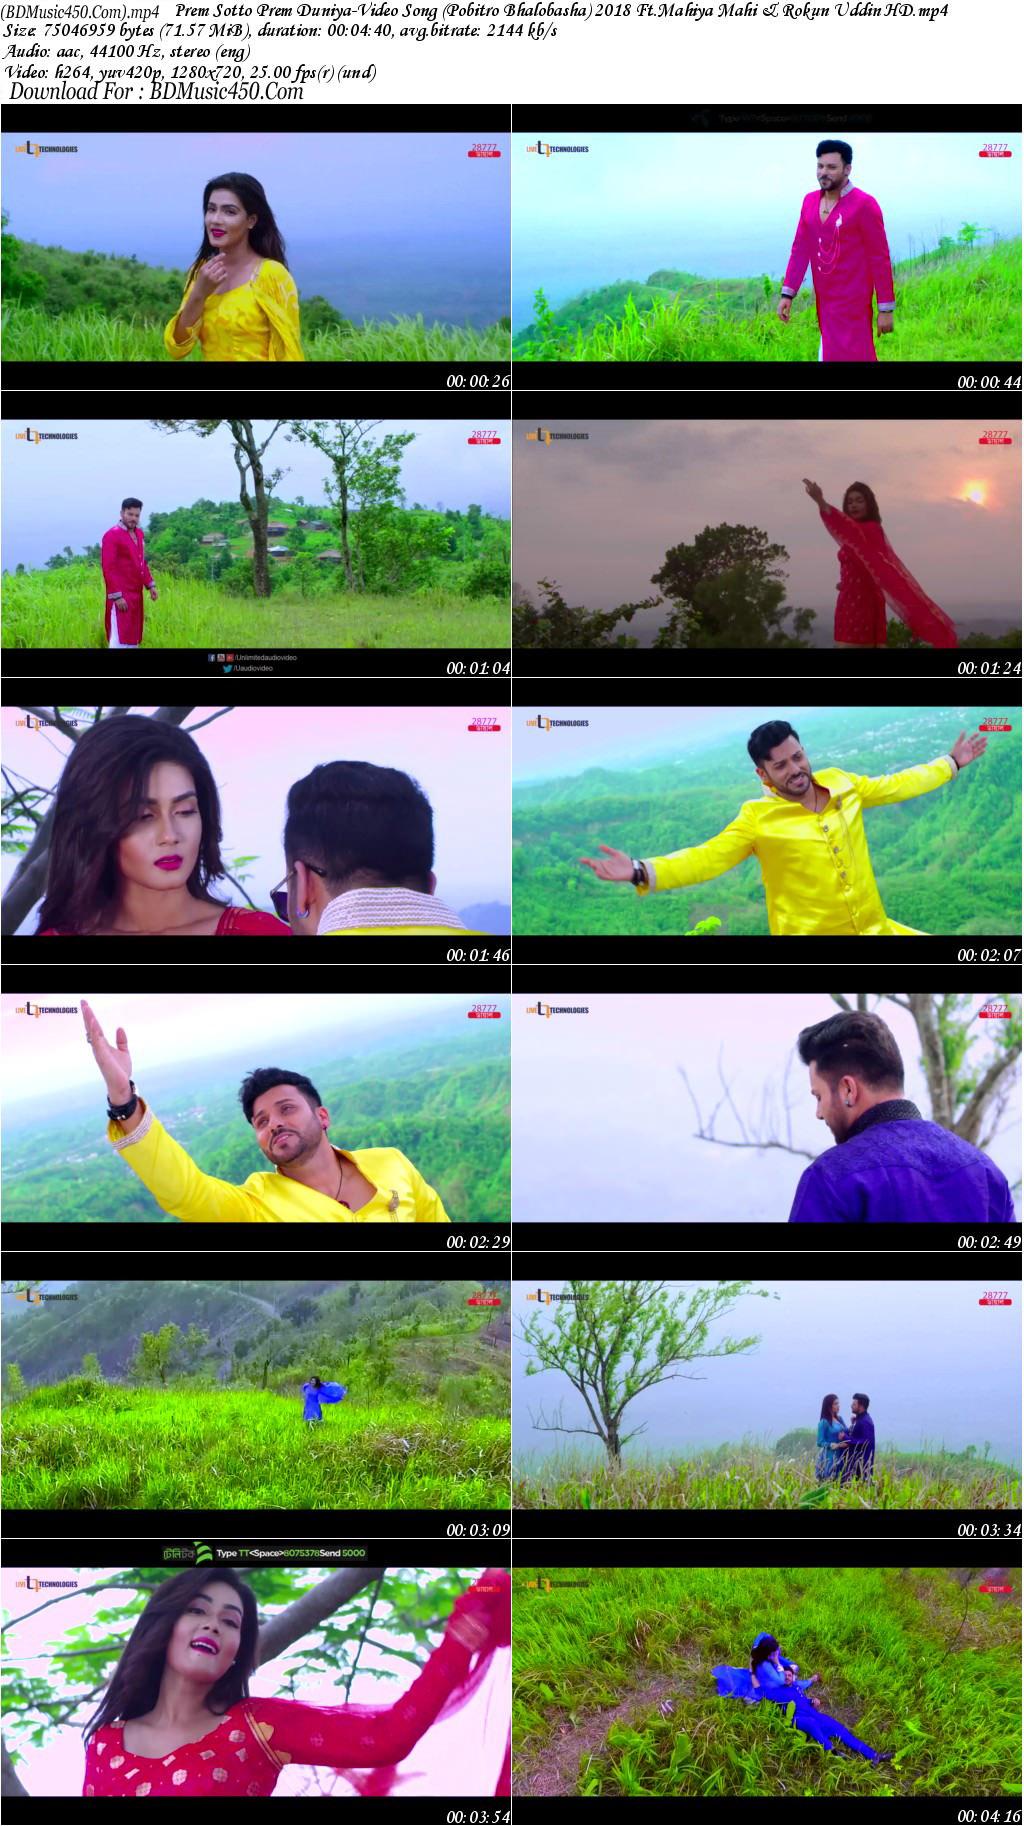 Prem Sotto Prem Duniya 2018 Bangla Video (Pobitro Bhalobasha) By.Mahiya Mahi & Rokun Uddin HD